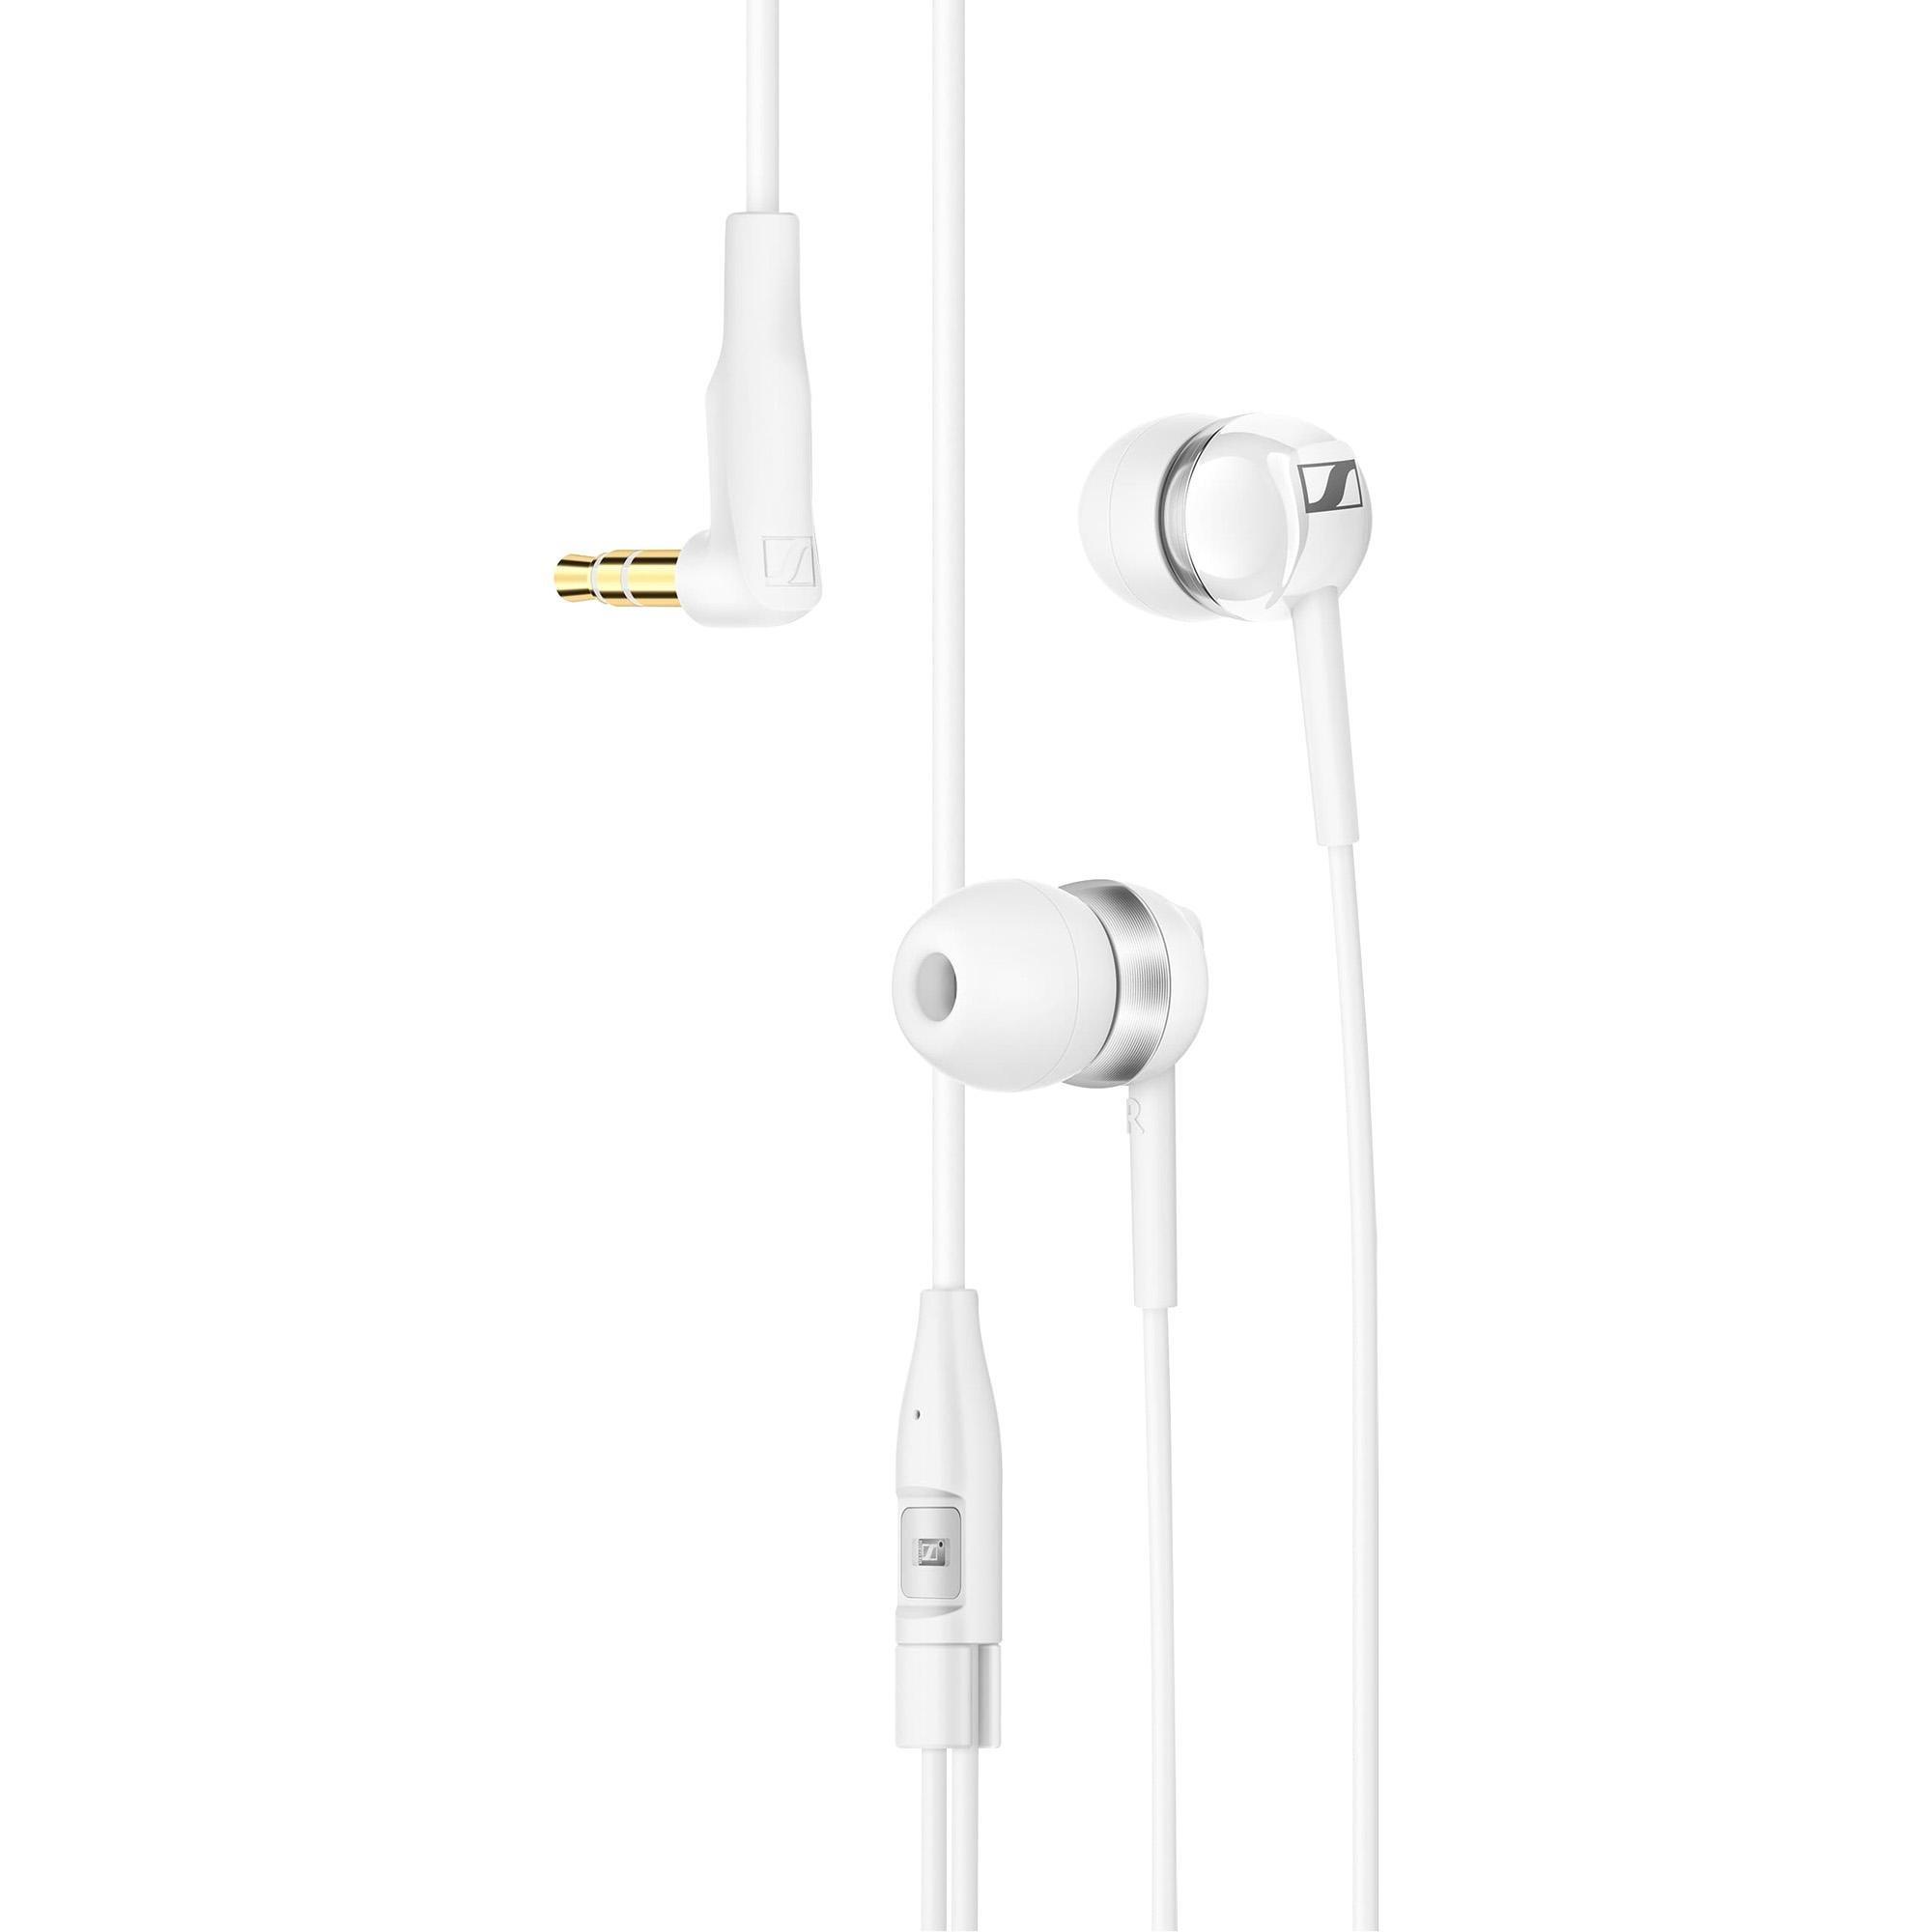 Fone de Ouvido CX100 Branco SENNHEISER